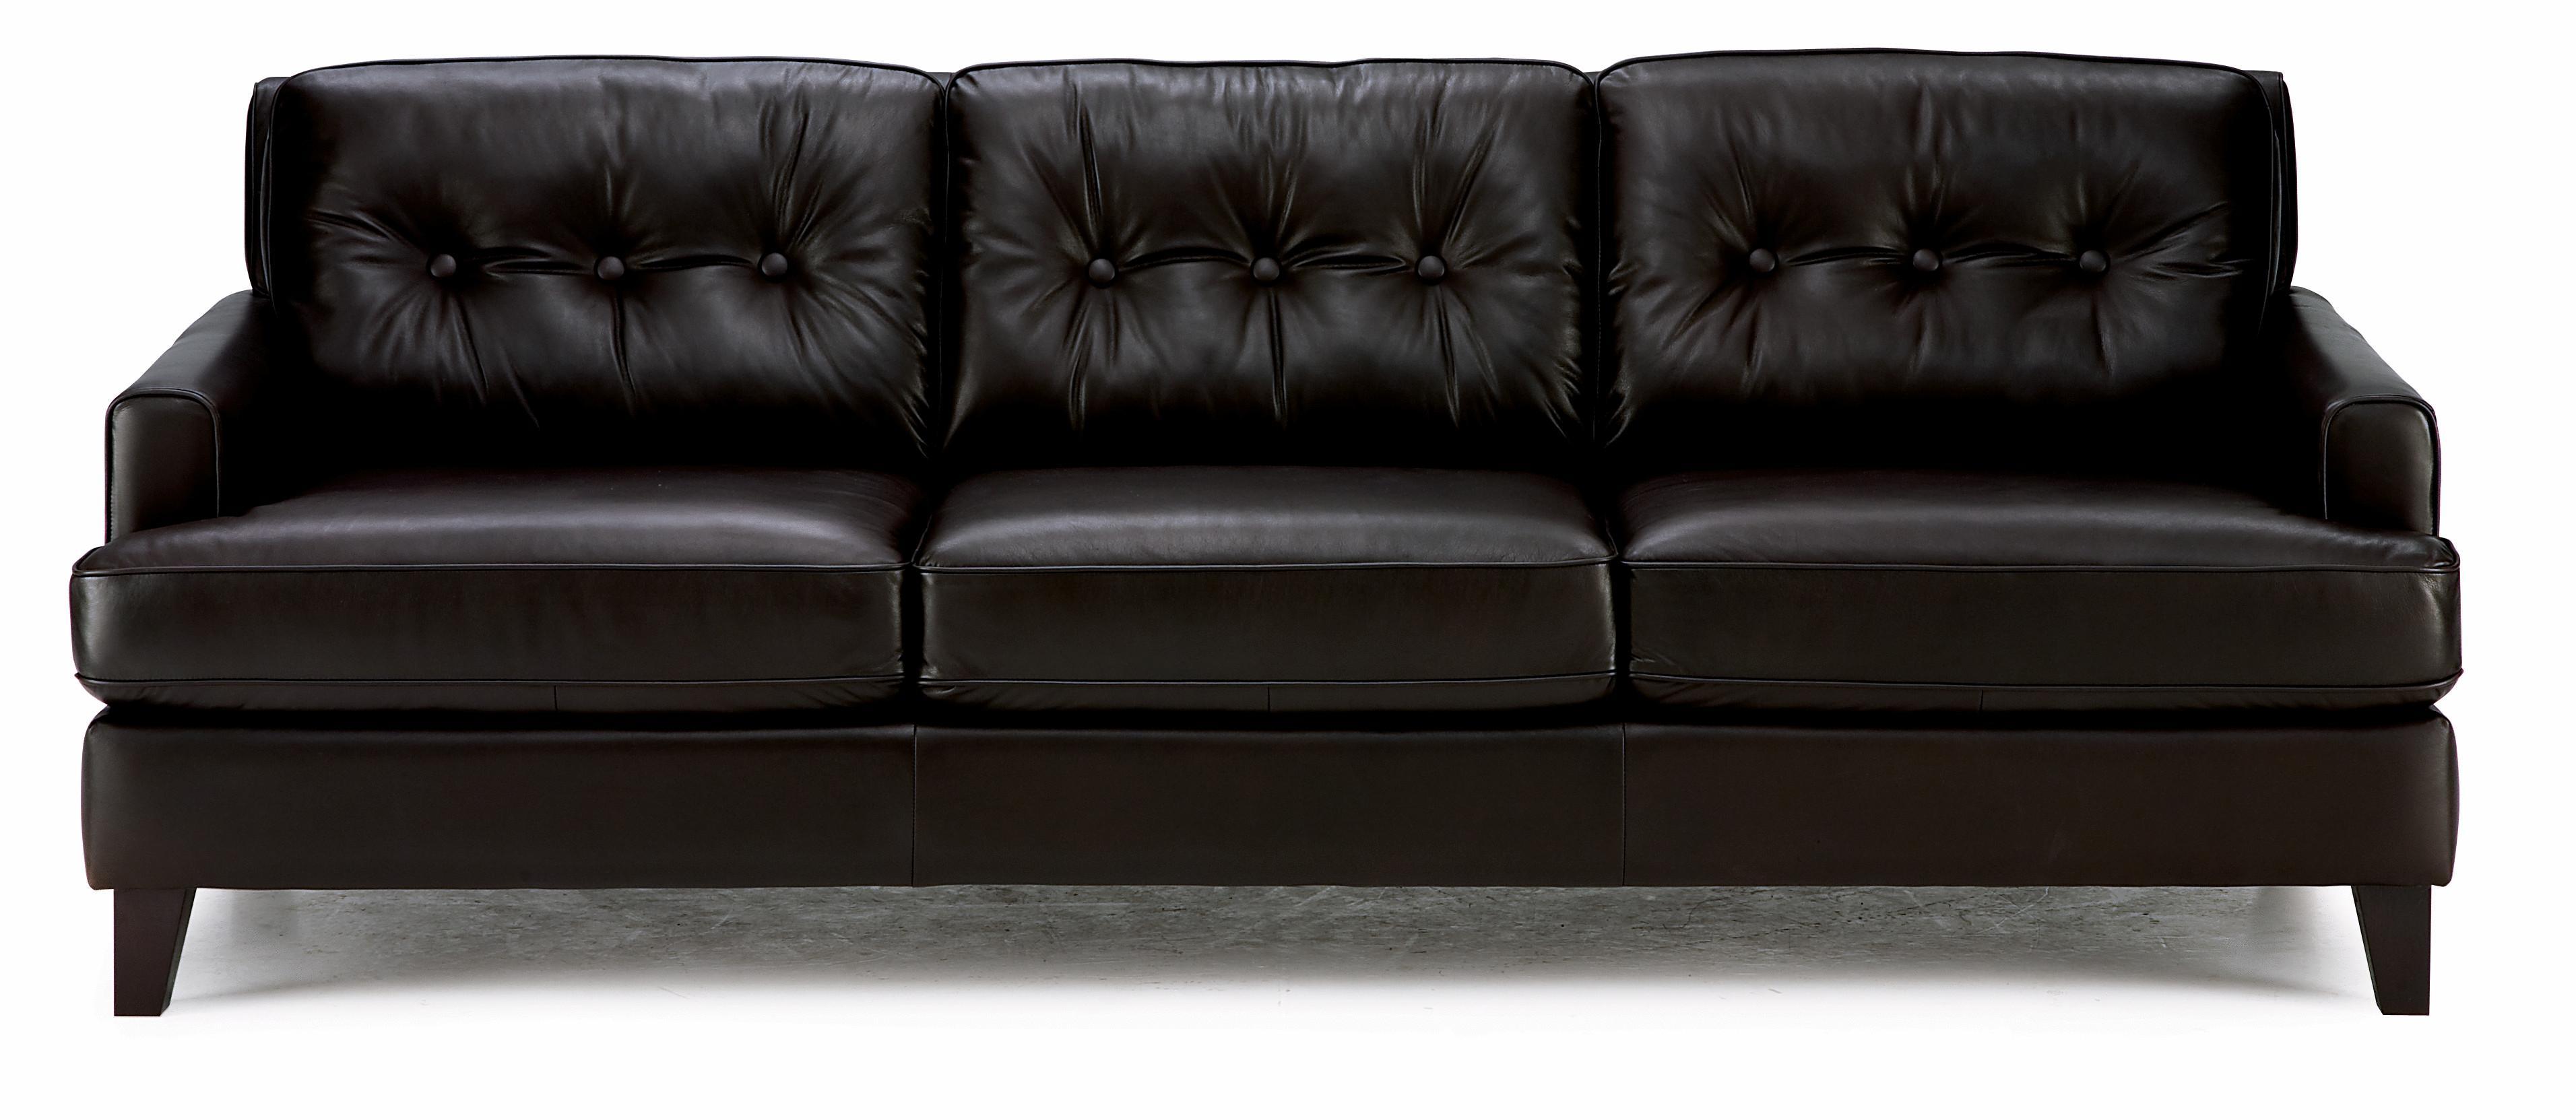 Palliser Barbara Transitional Stationary Sofa With Tapered